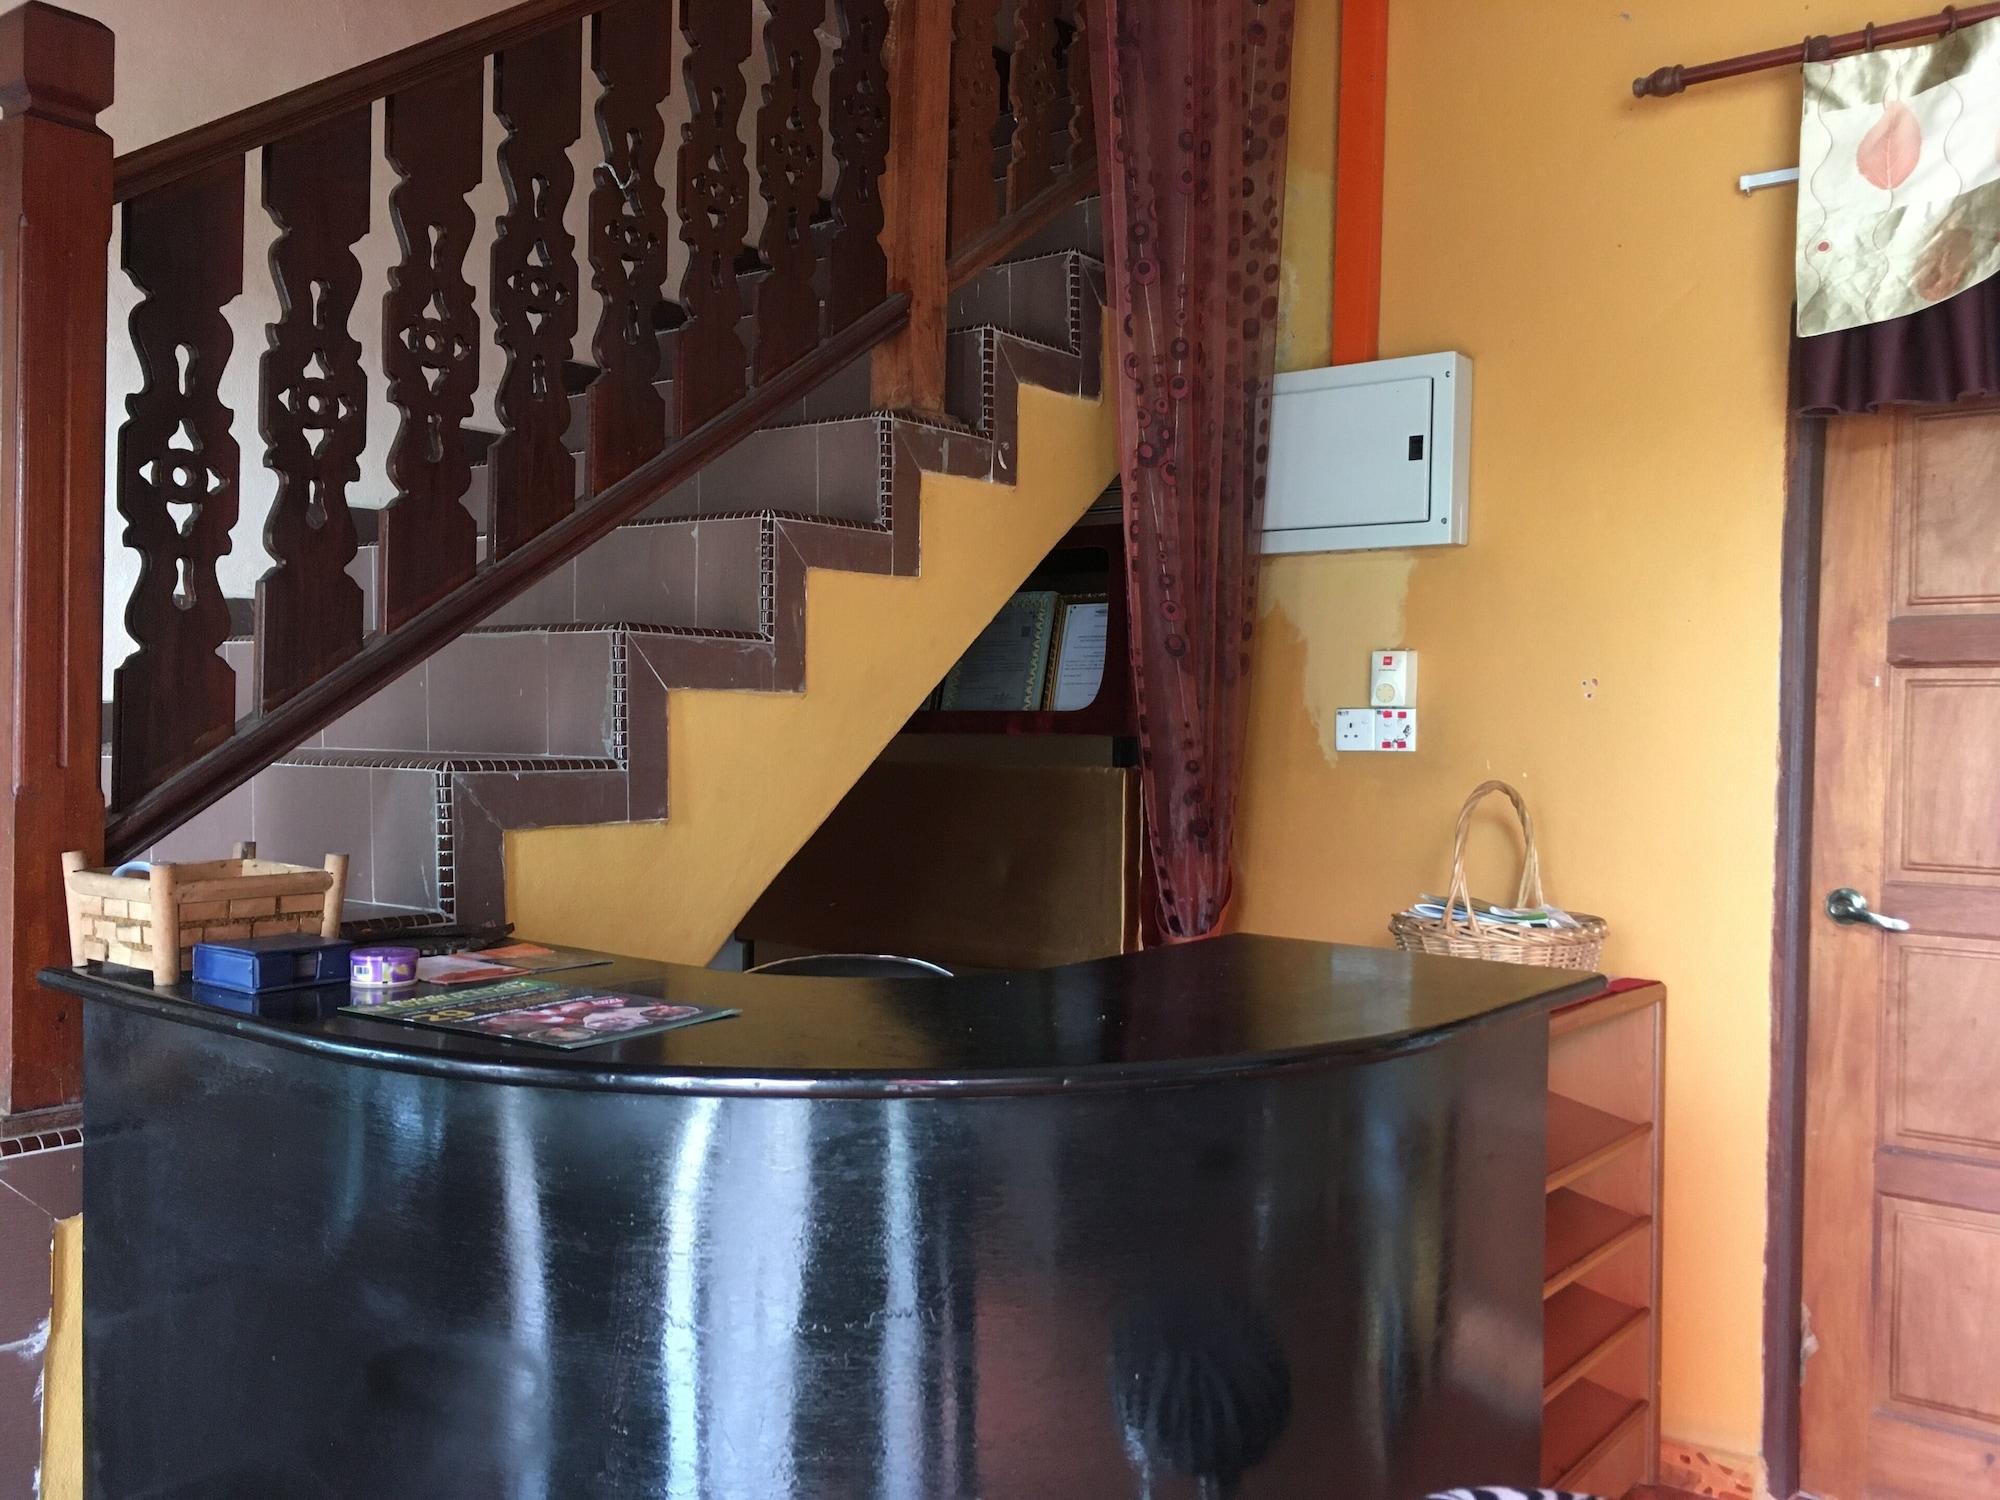 OYO 89653 Anisaa Inn, Kota Bharu